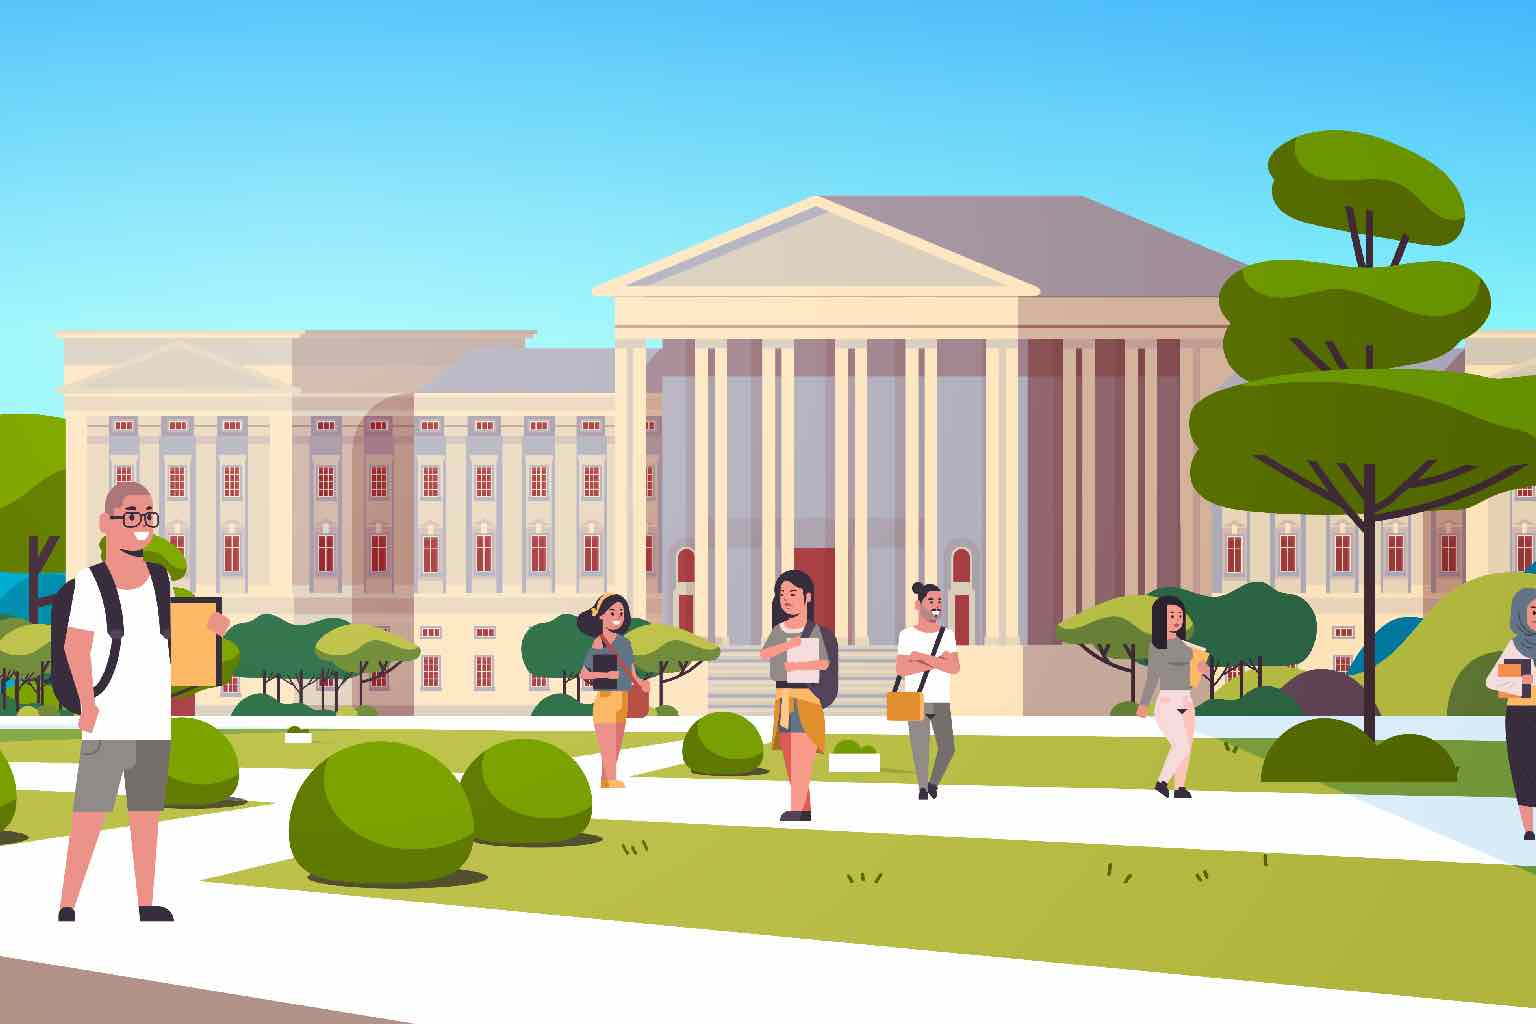 Cartoon of concept of a university building